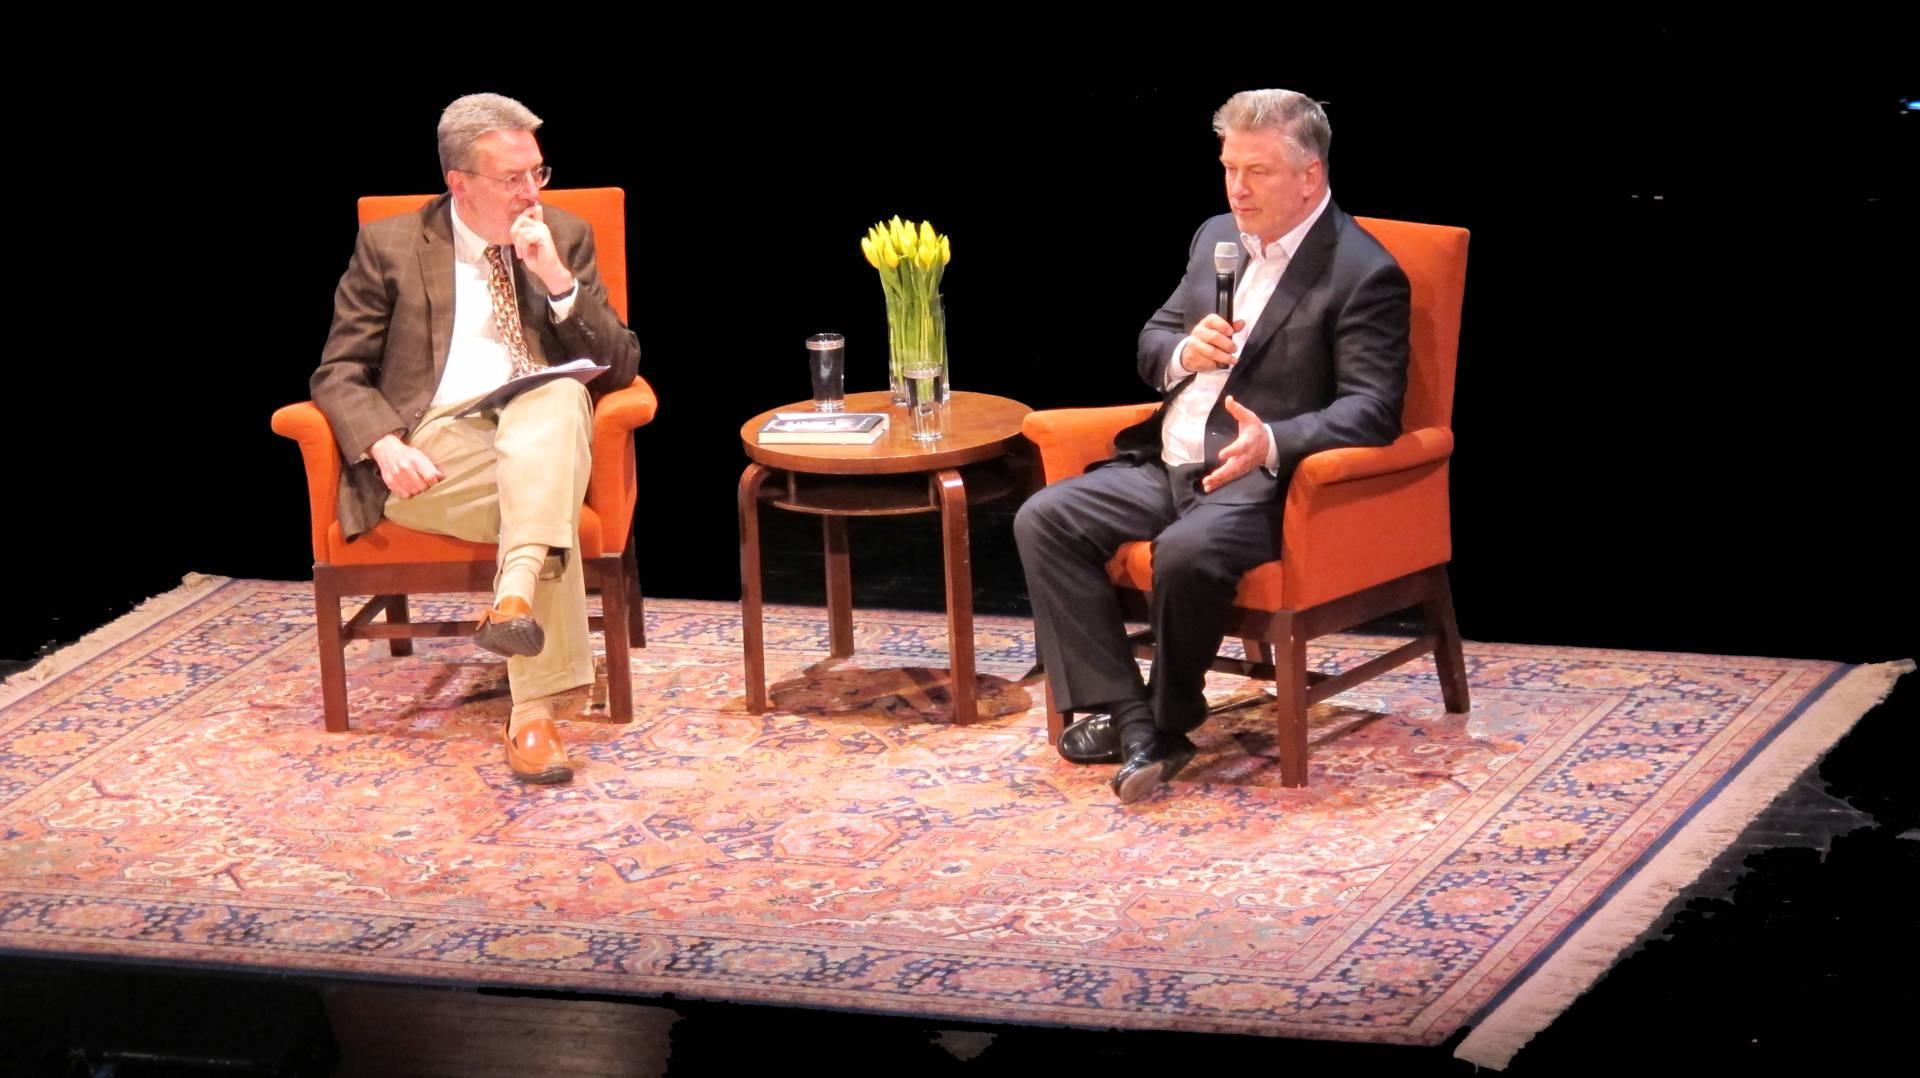 Alec Baldwin in conversation with Steven Winn at San Francisco's Nourse Theater on April 13, 2017.